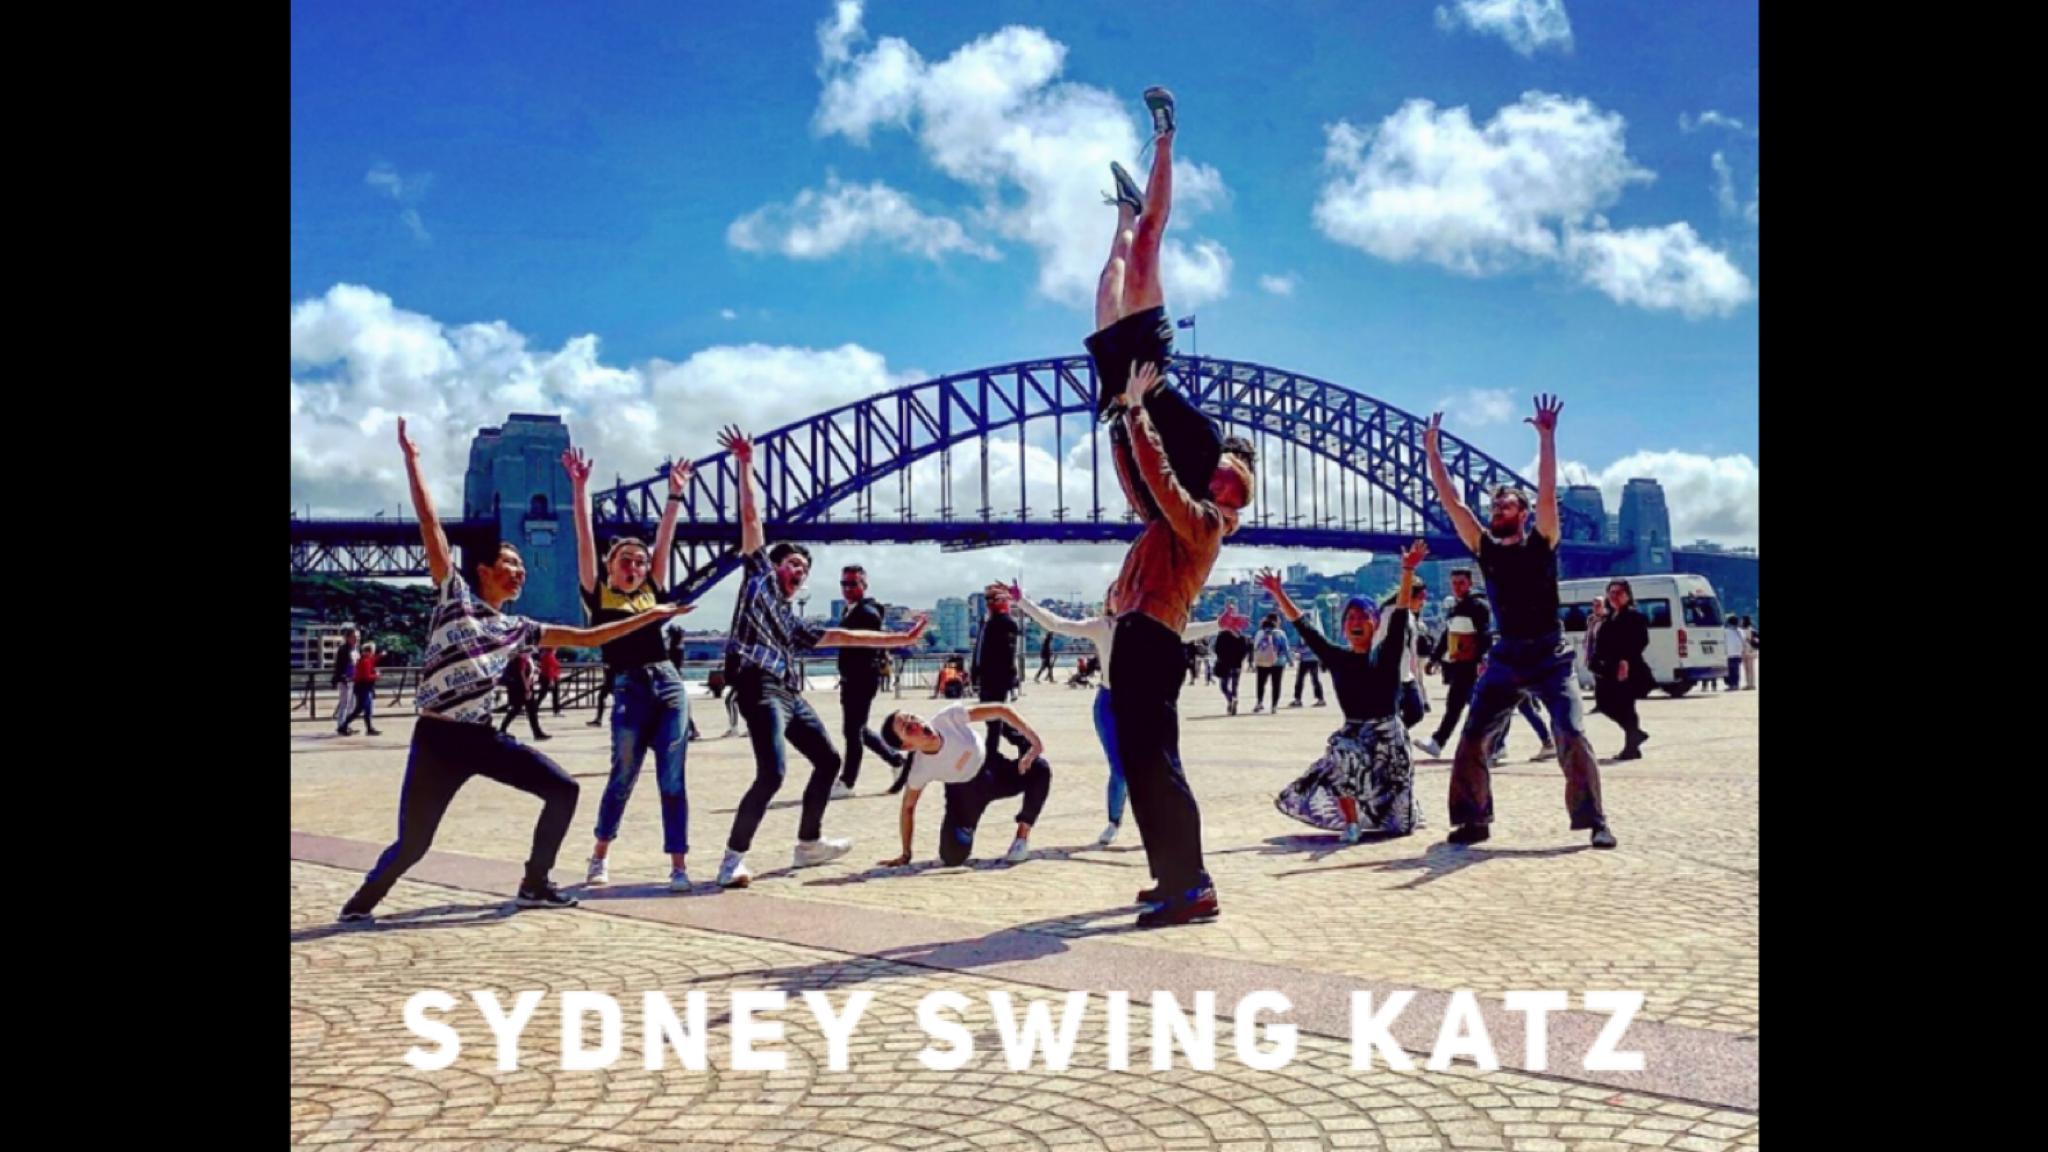 sydney swing Katz